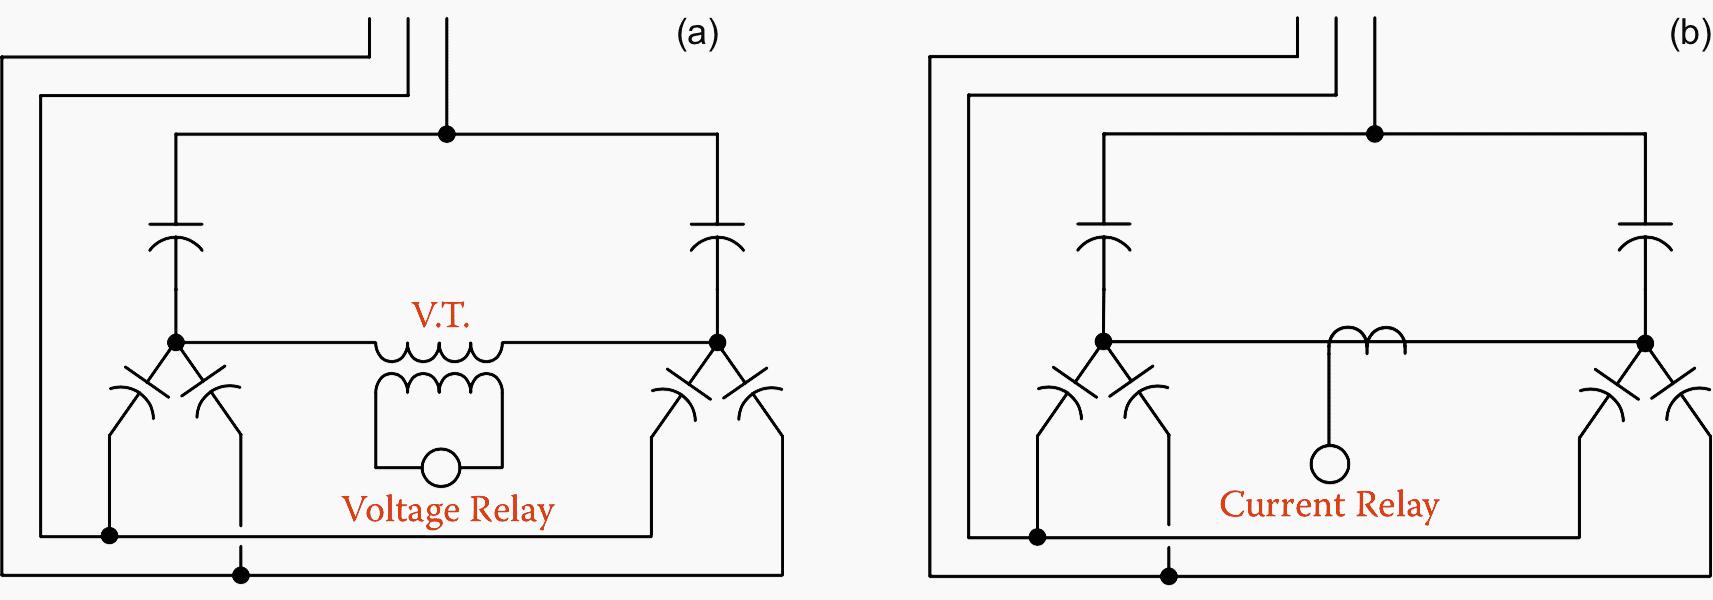 hight resolution of a voltage unbalance b current unbalance